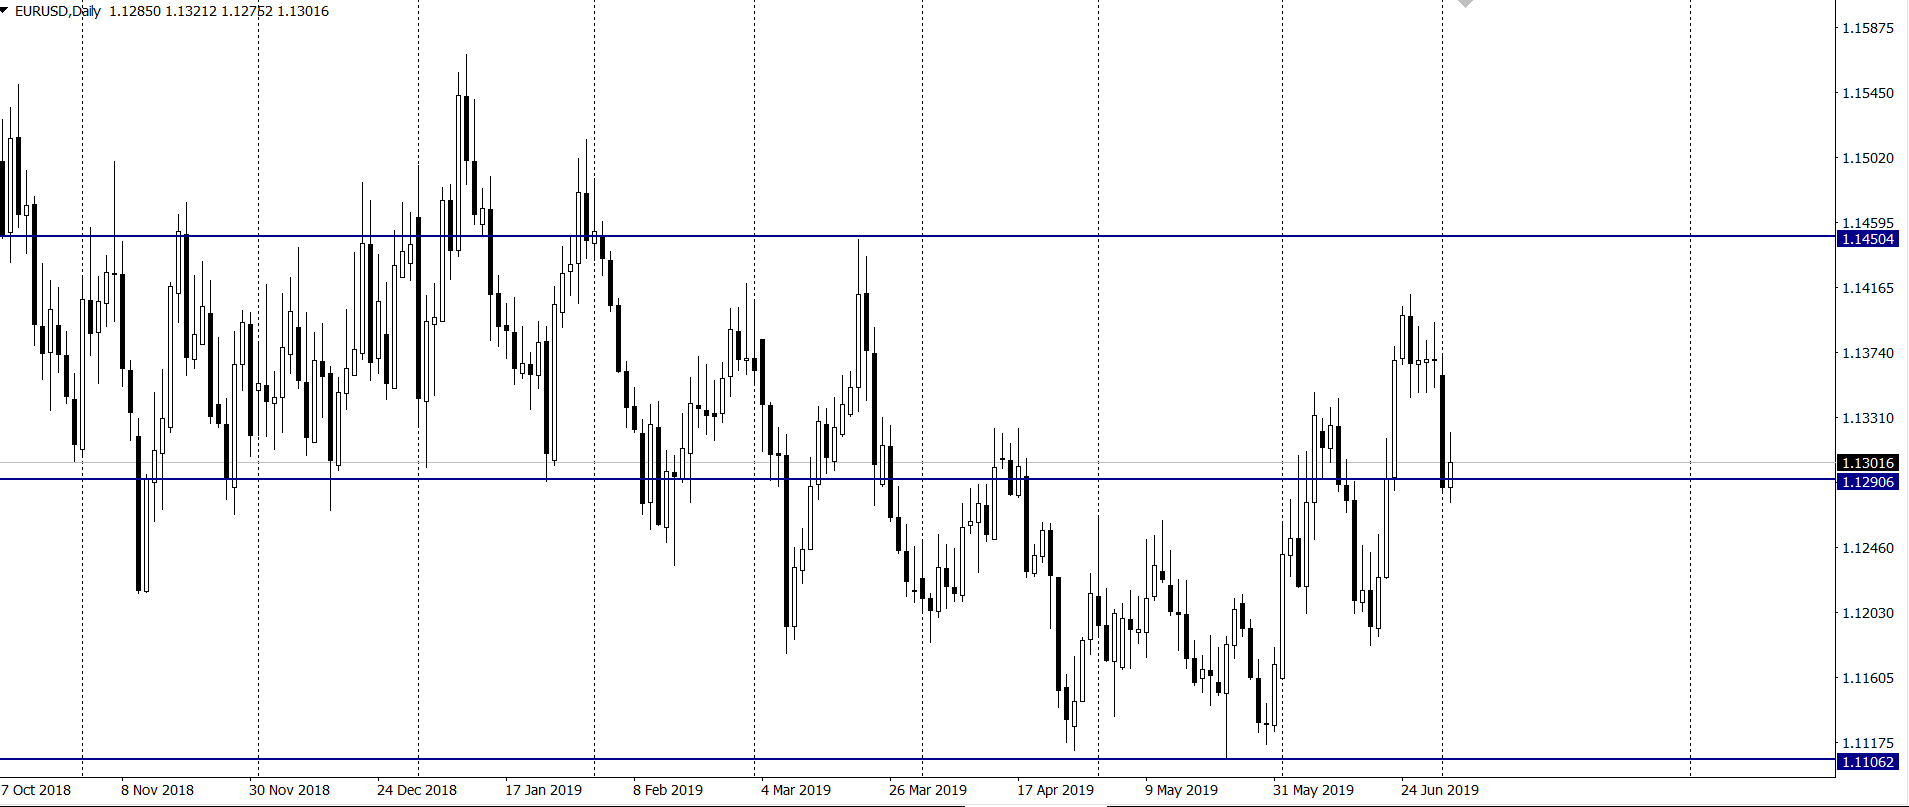 Kurs euro do dolara we wtorek na interwale dziennym 2 7 19